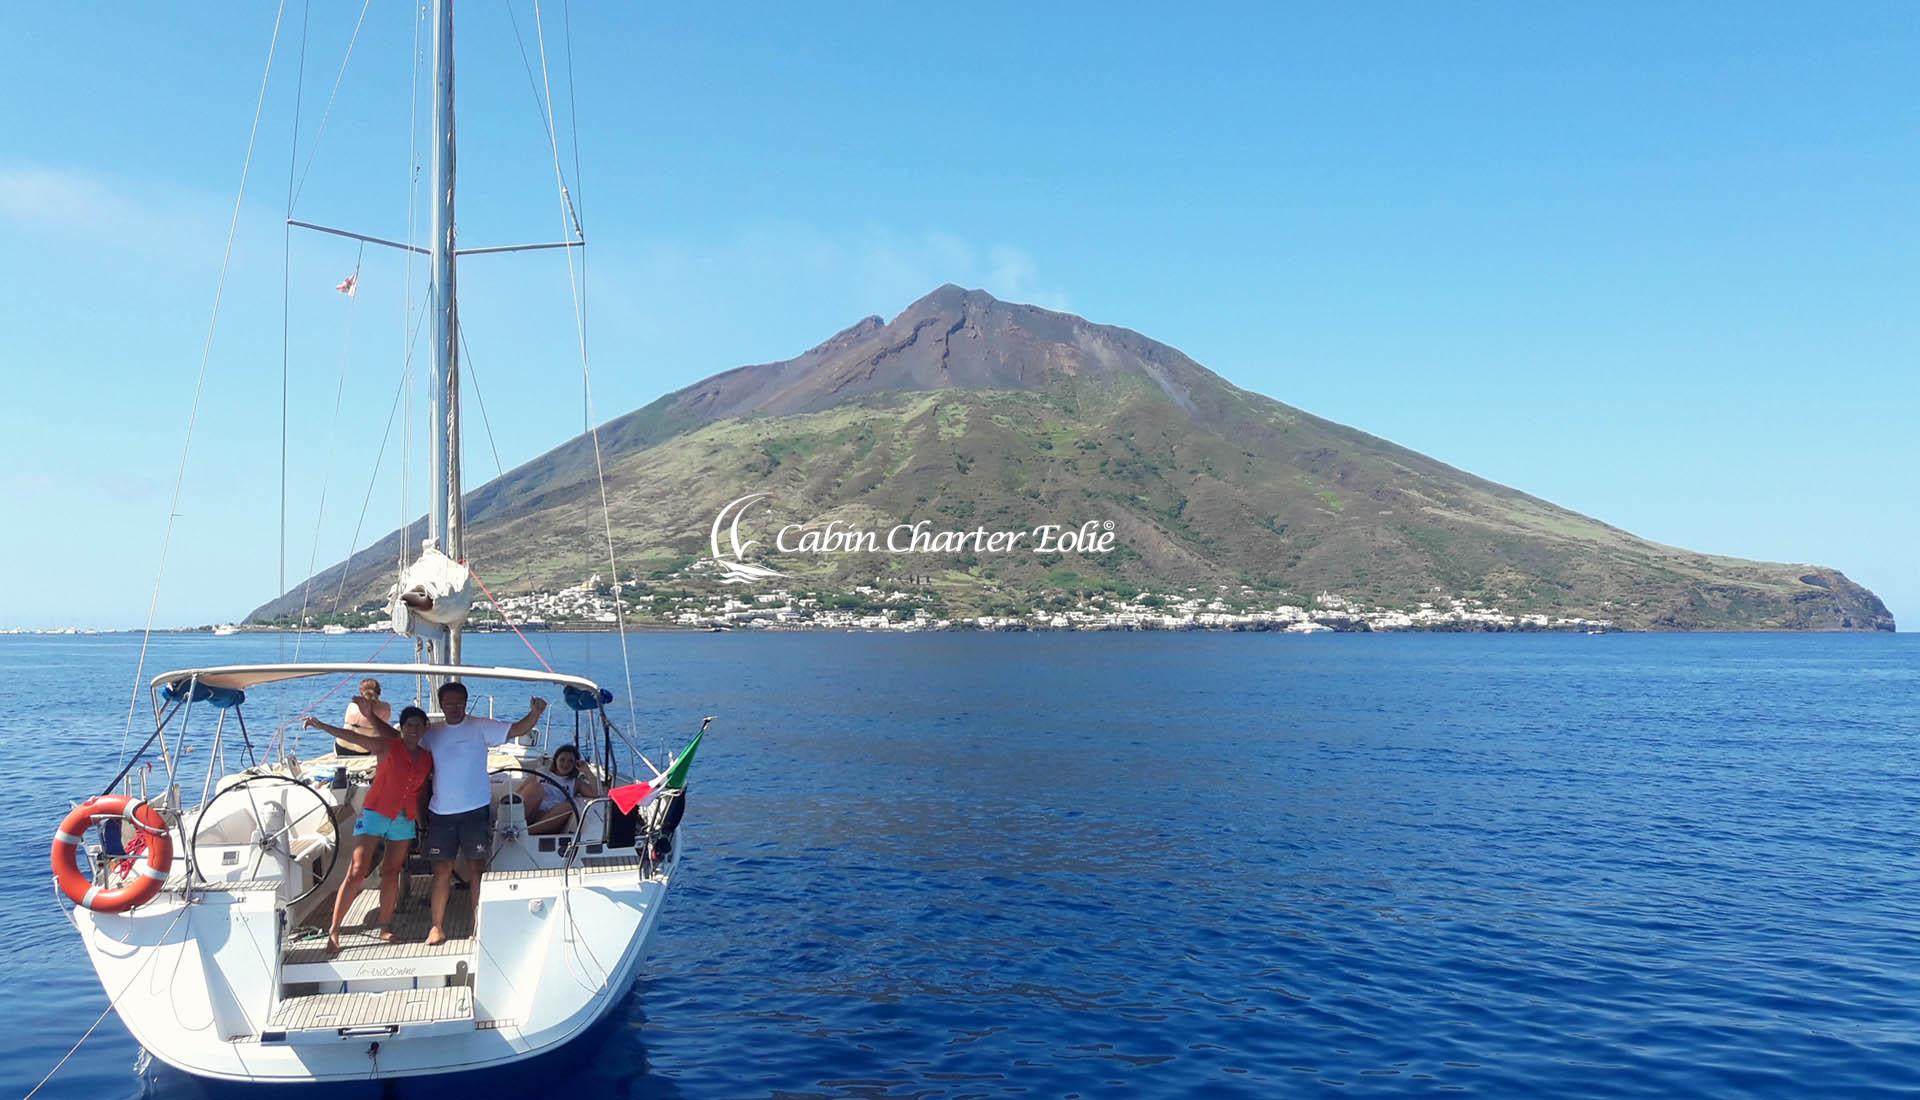 Stromboli - Amici - Single - Barca a Vela - Cabin Charter Eolie